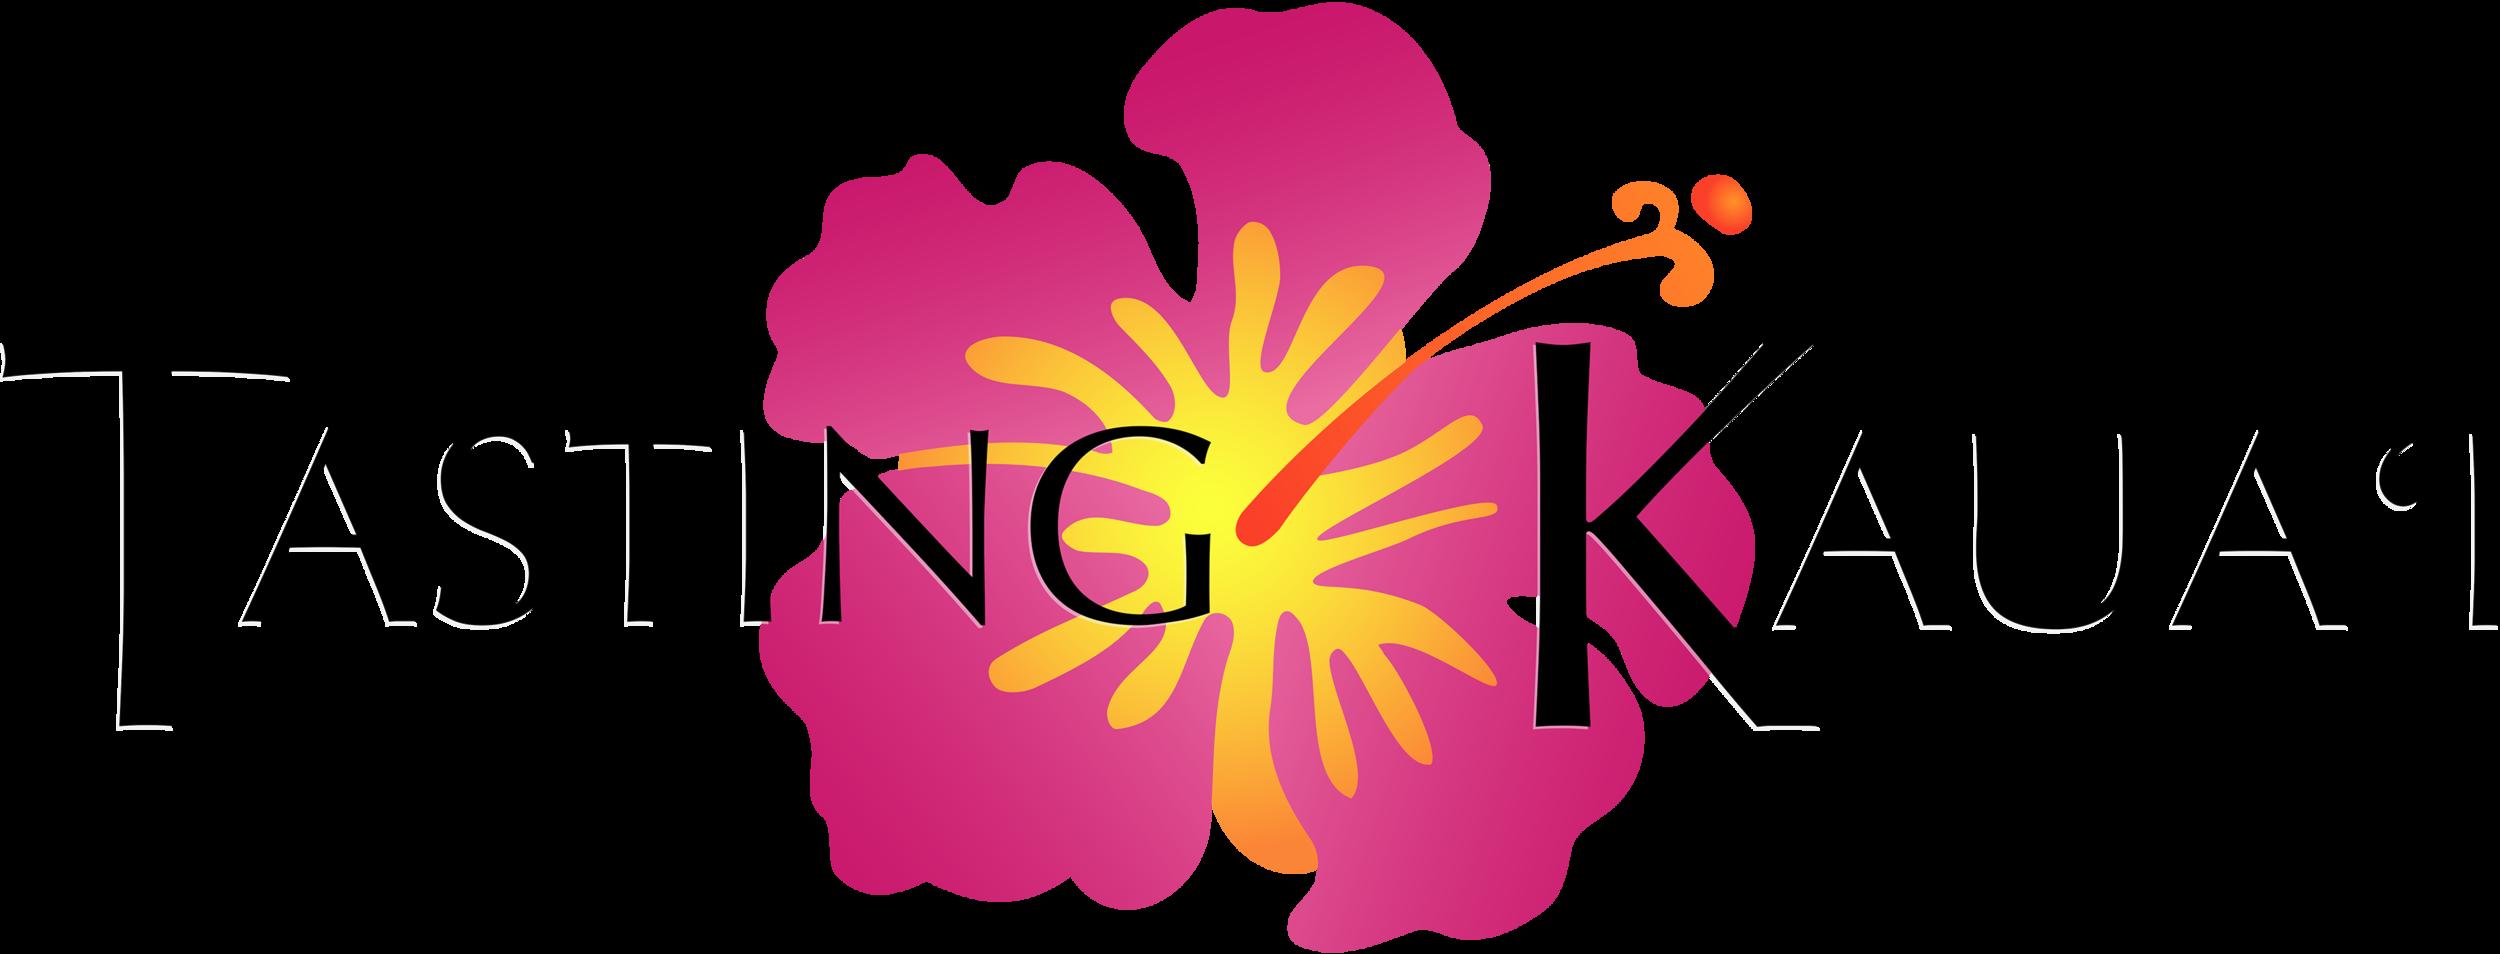 - Follow us on IG @TastingKauai - Join us for tours www.tastingkauai.com